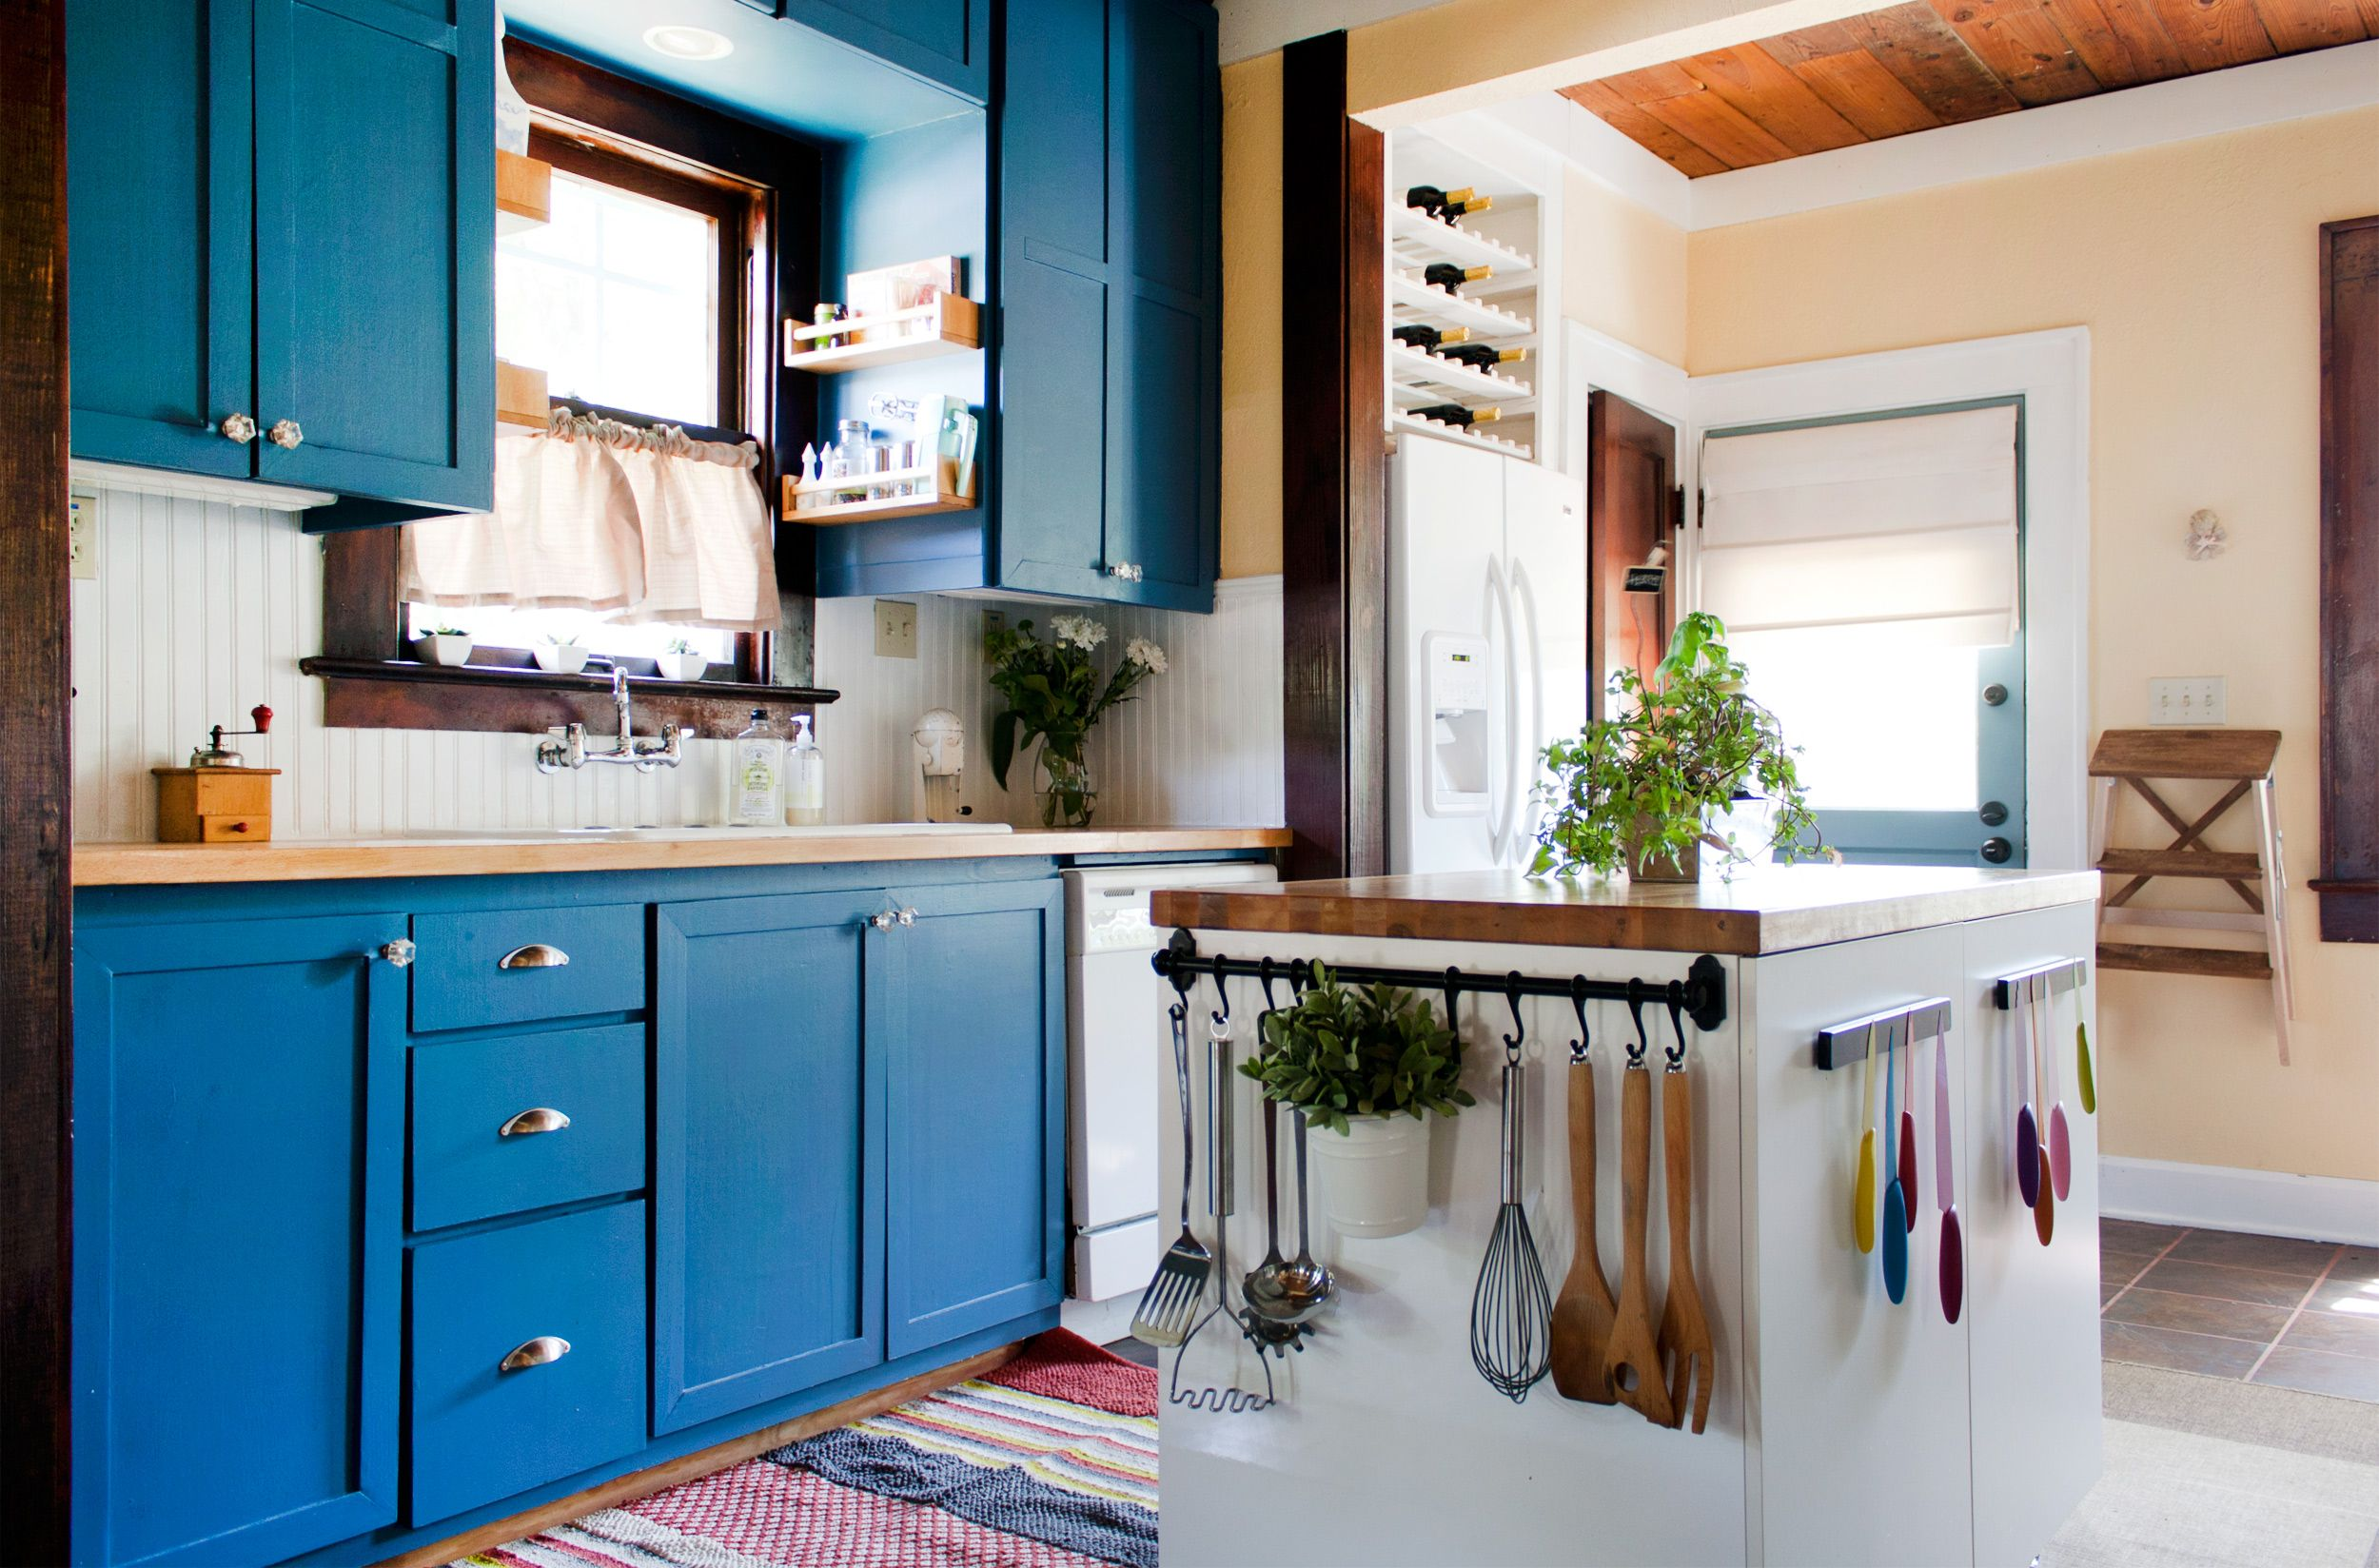 kristen michelle s modern bohemian interior design kitchen bohemian house home kitchens on kitchen interior boho id=50133